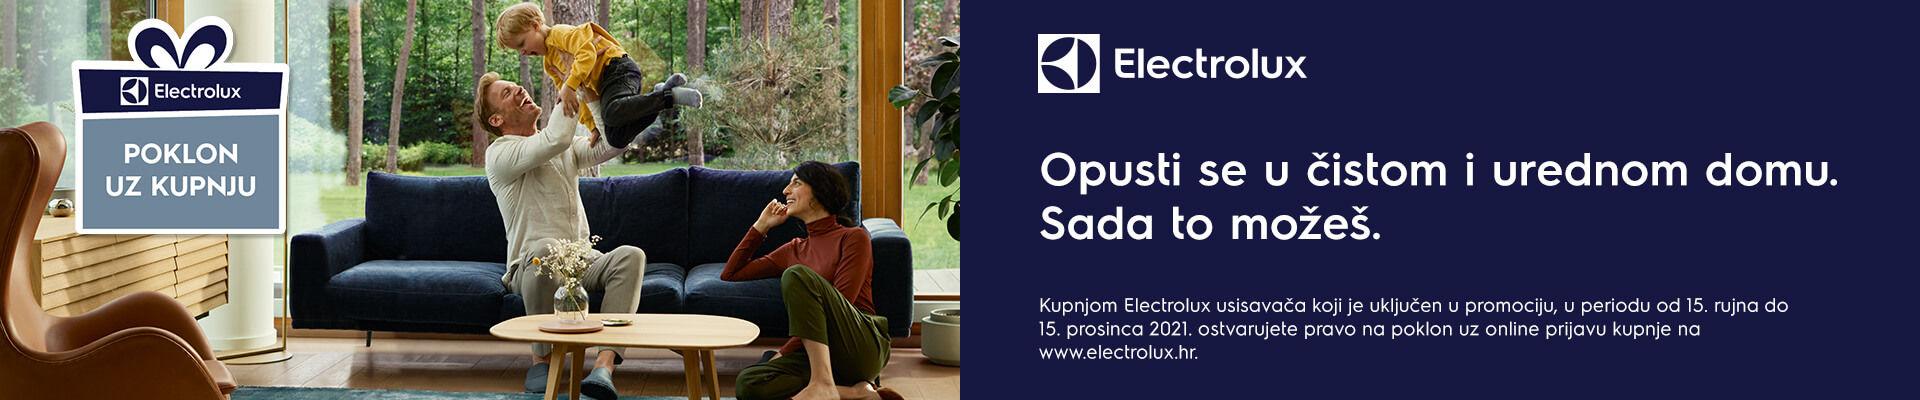 alles-electrolux-usisavaci-poklon